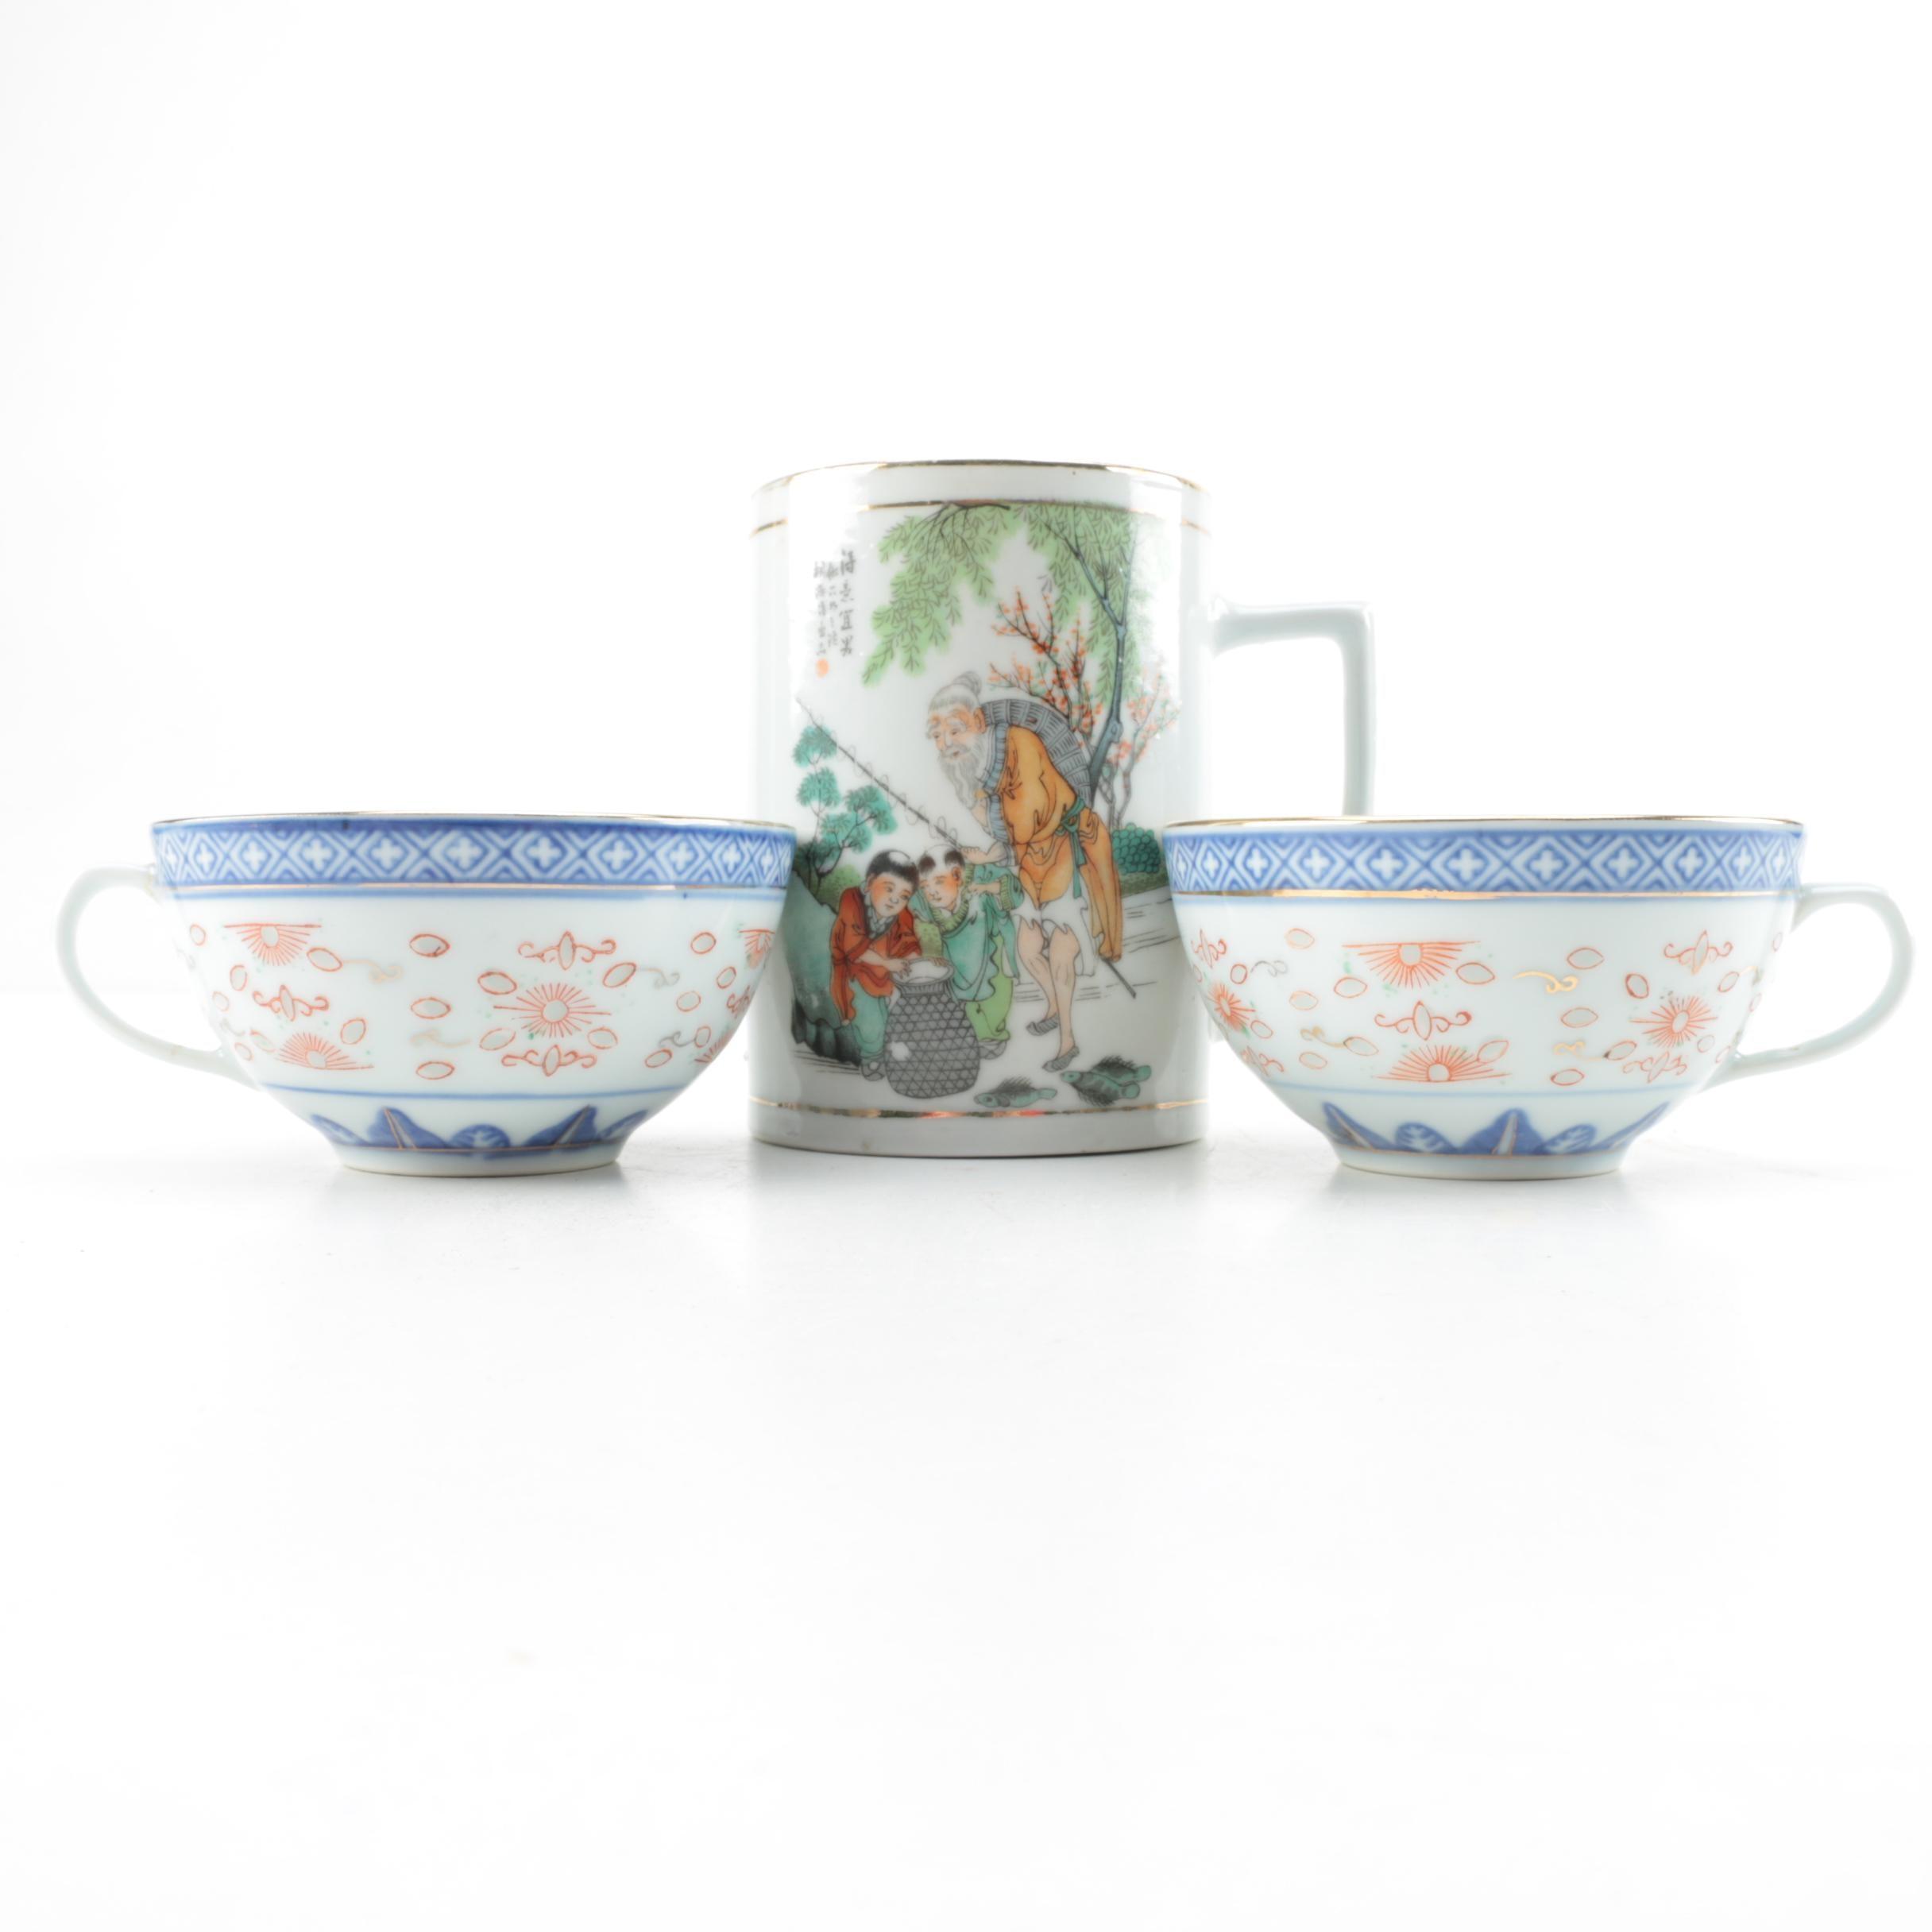 Chinese Porcelain Mug and Tea Cups